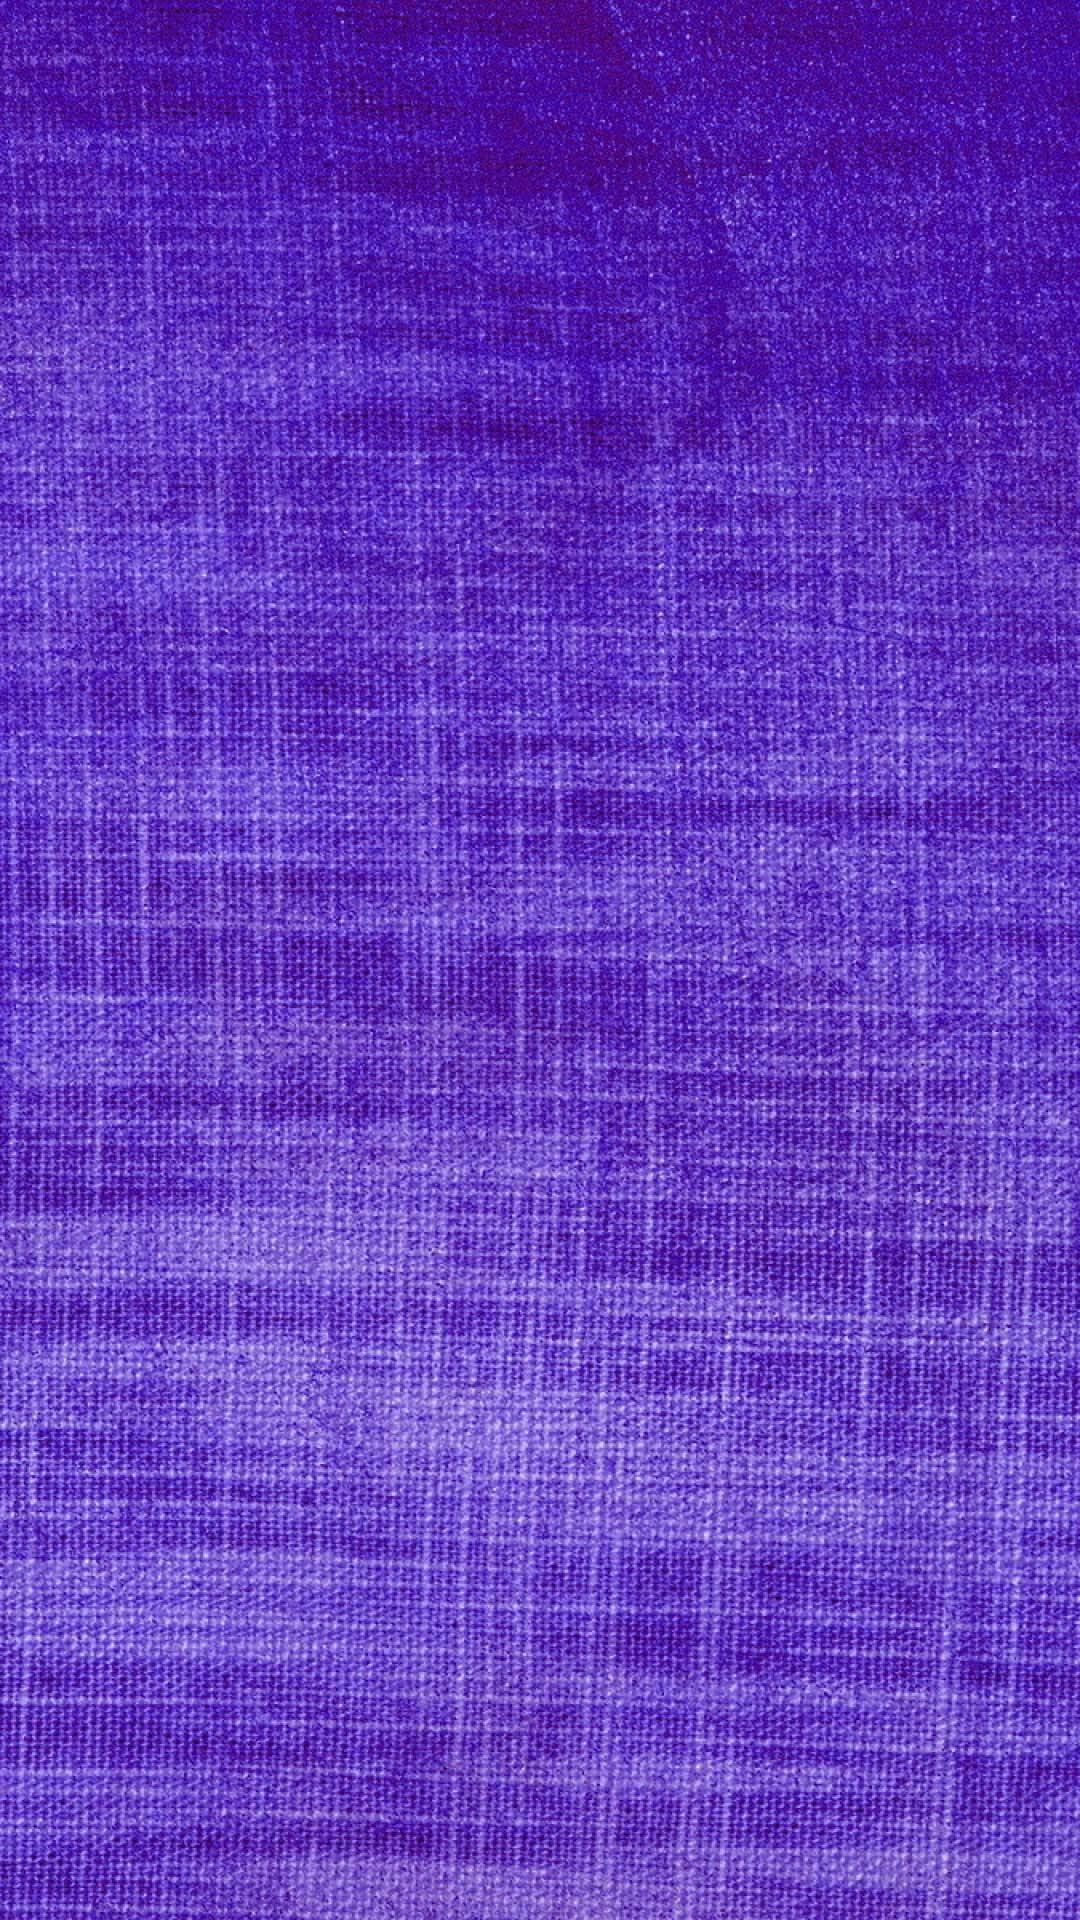 purple-iphone-wallpaper1-338×600